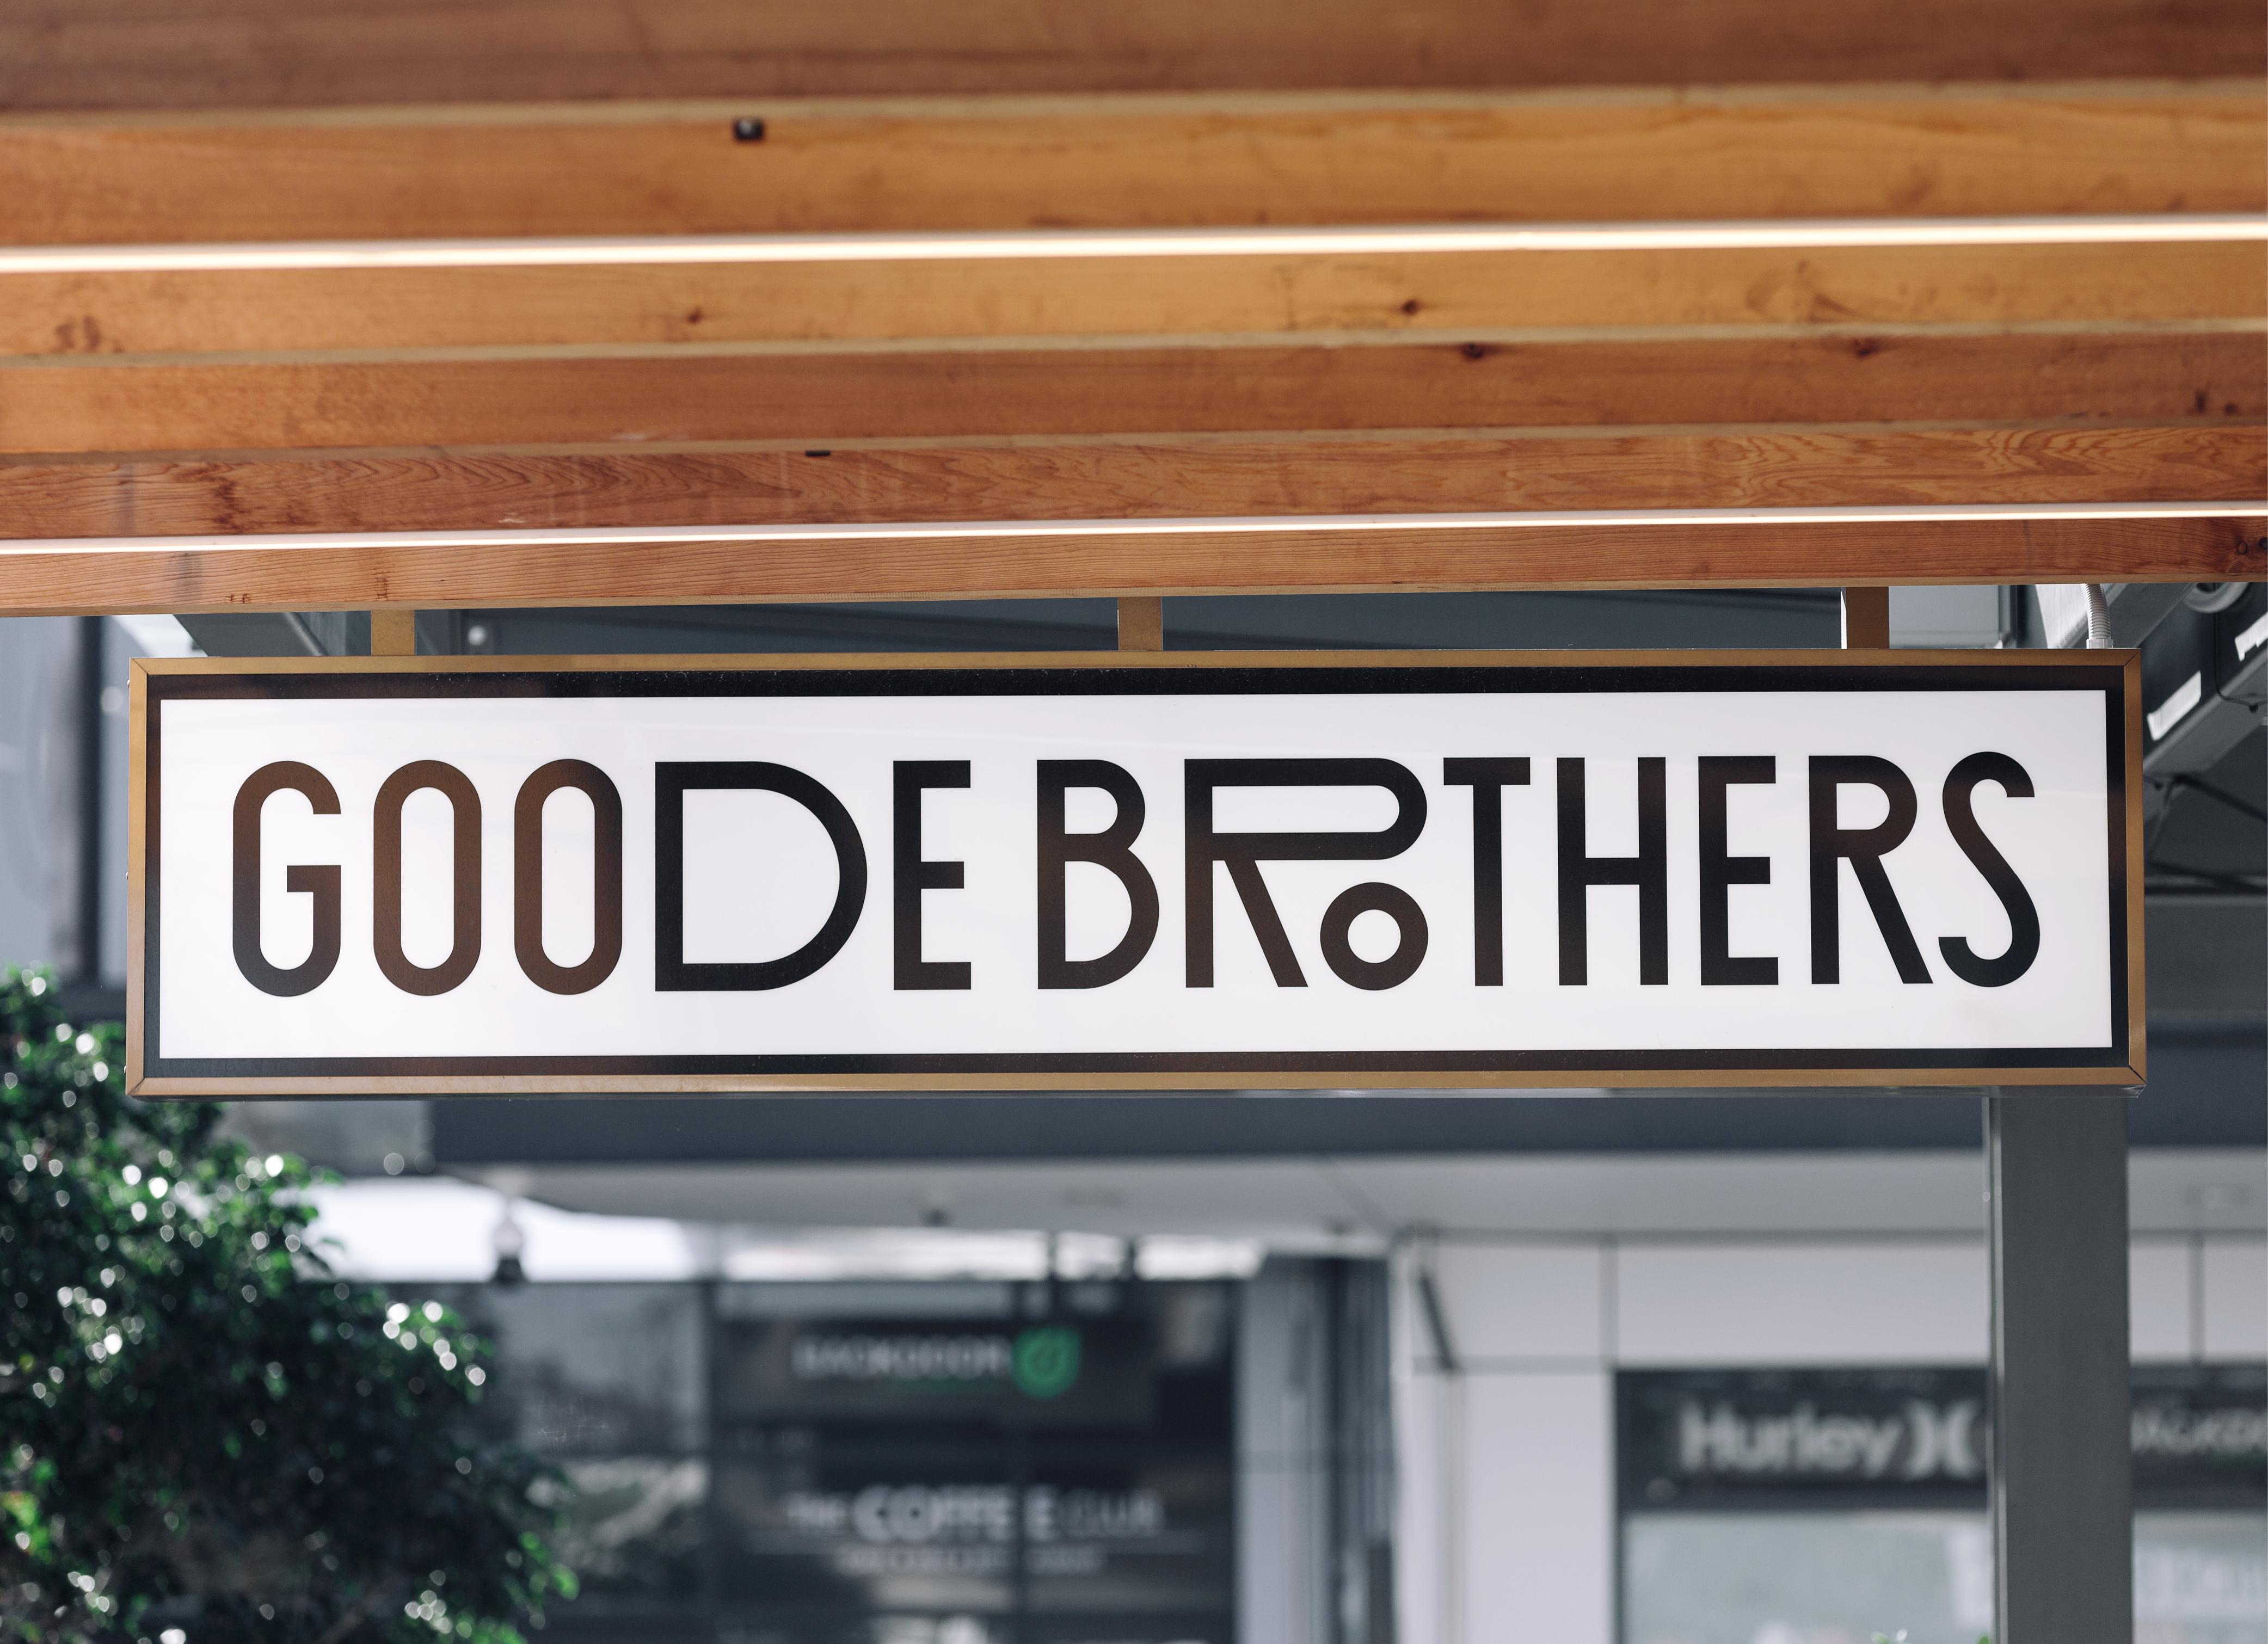 https://tanamitchell.com/wp-content/uploads/2018/07/Goode-Bros-2000x1450px3.jpg